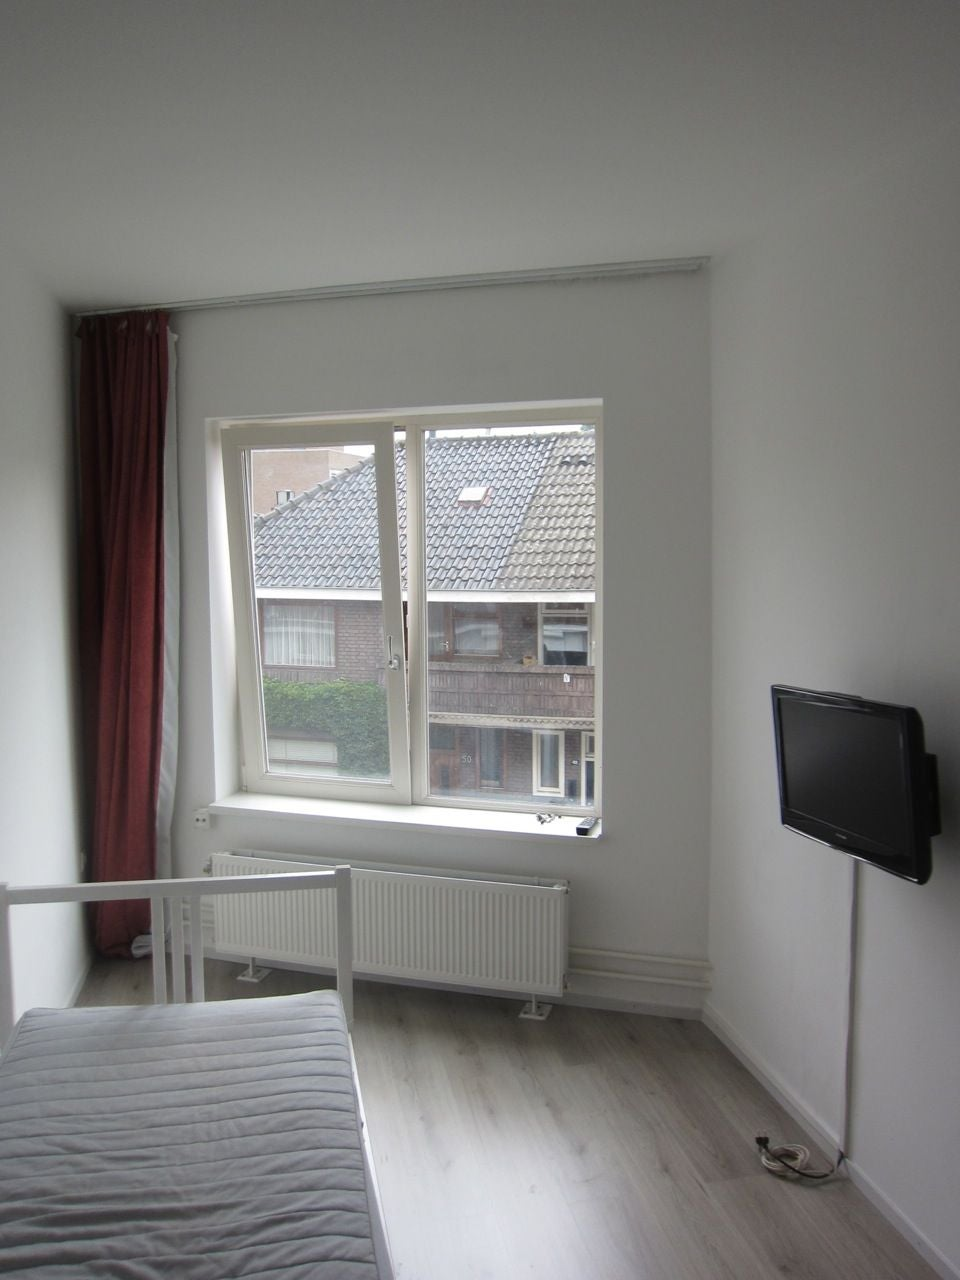 https://public.parariusoffice.nl/298/photos/huge/83.1396950751-837.jpg